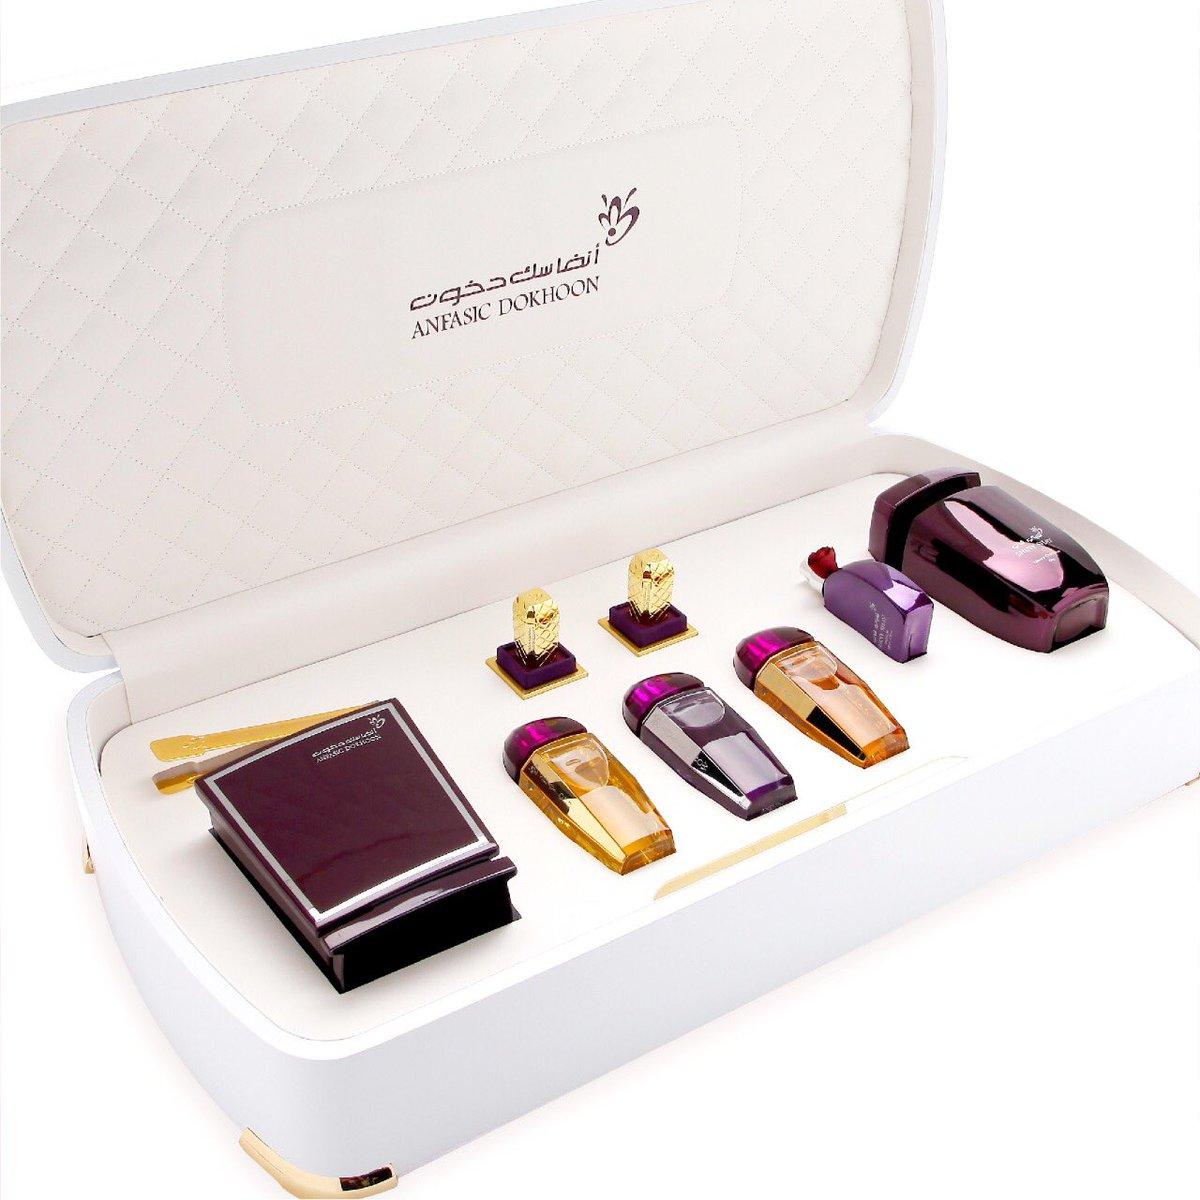 2bee641b1 صندوق فاخر مع منتجاتنا الفاخرة مصنوعة خصيصاً لك A luxurious box with our  luxurious products made